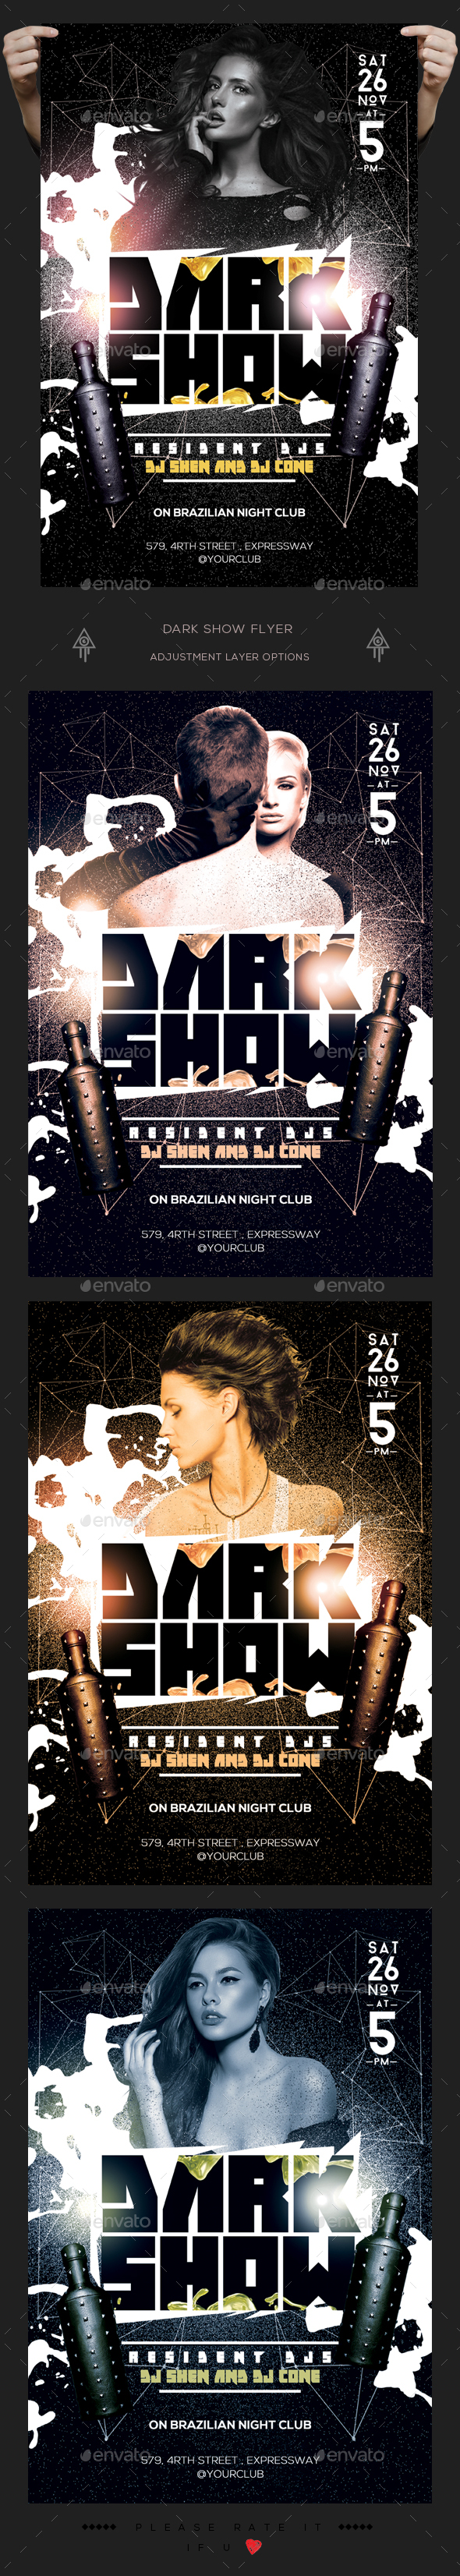 Dark Show Flyer - Clubs & Parties Events